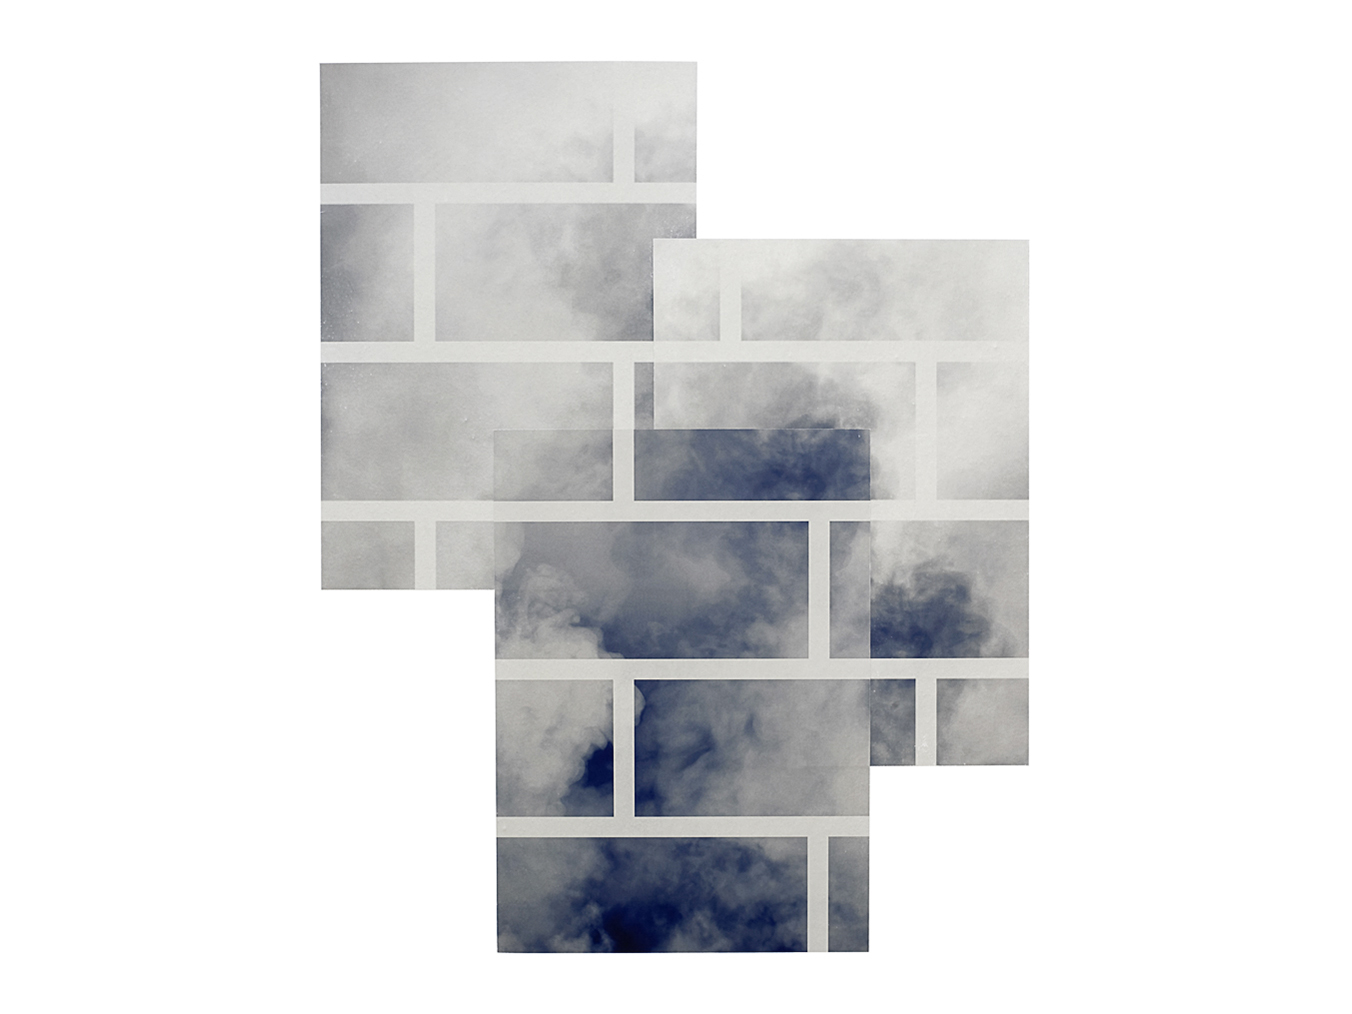 Benoit-Delaunay-artiste-dessins-2006-structure-03